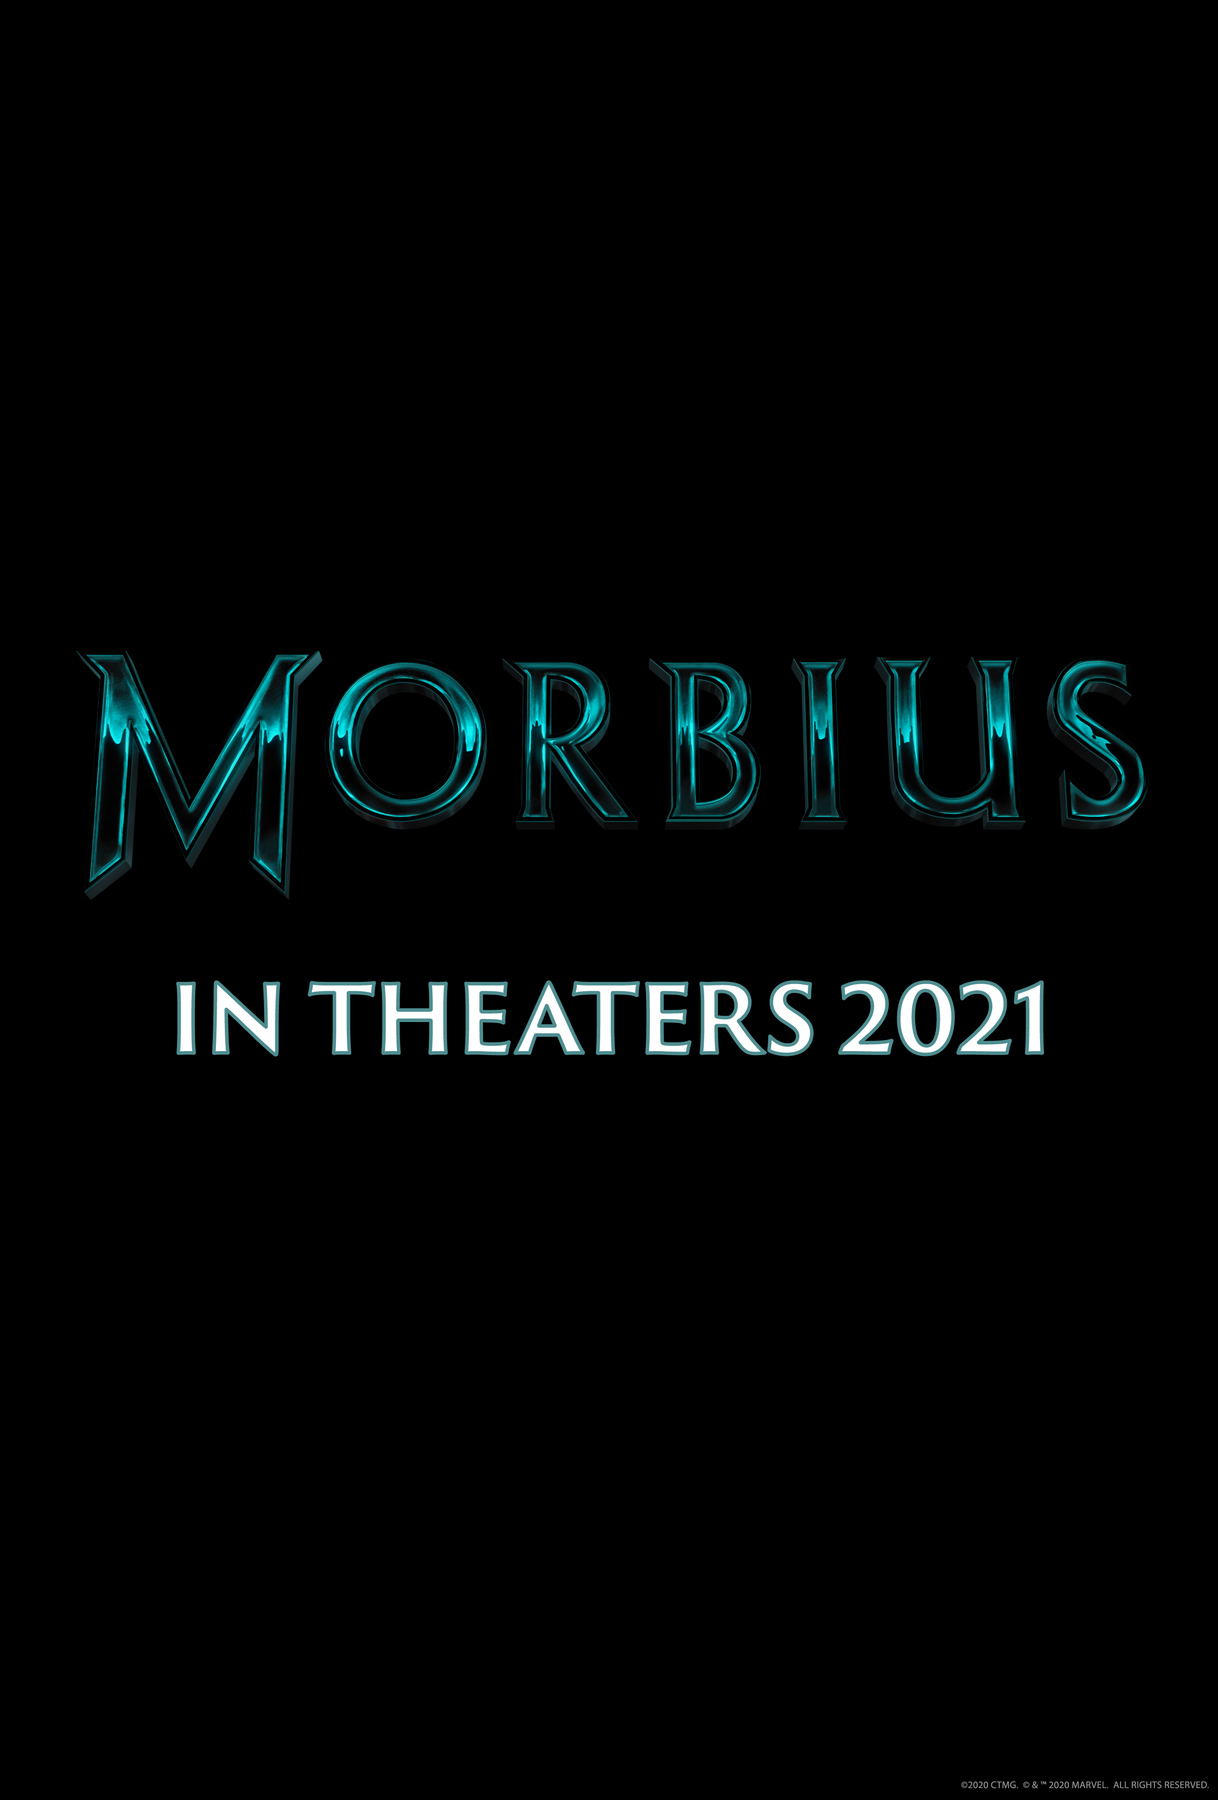 affiche poster morbius disney marvel